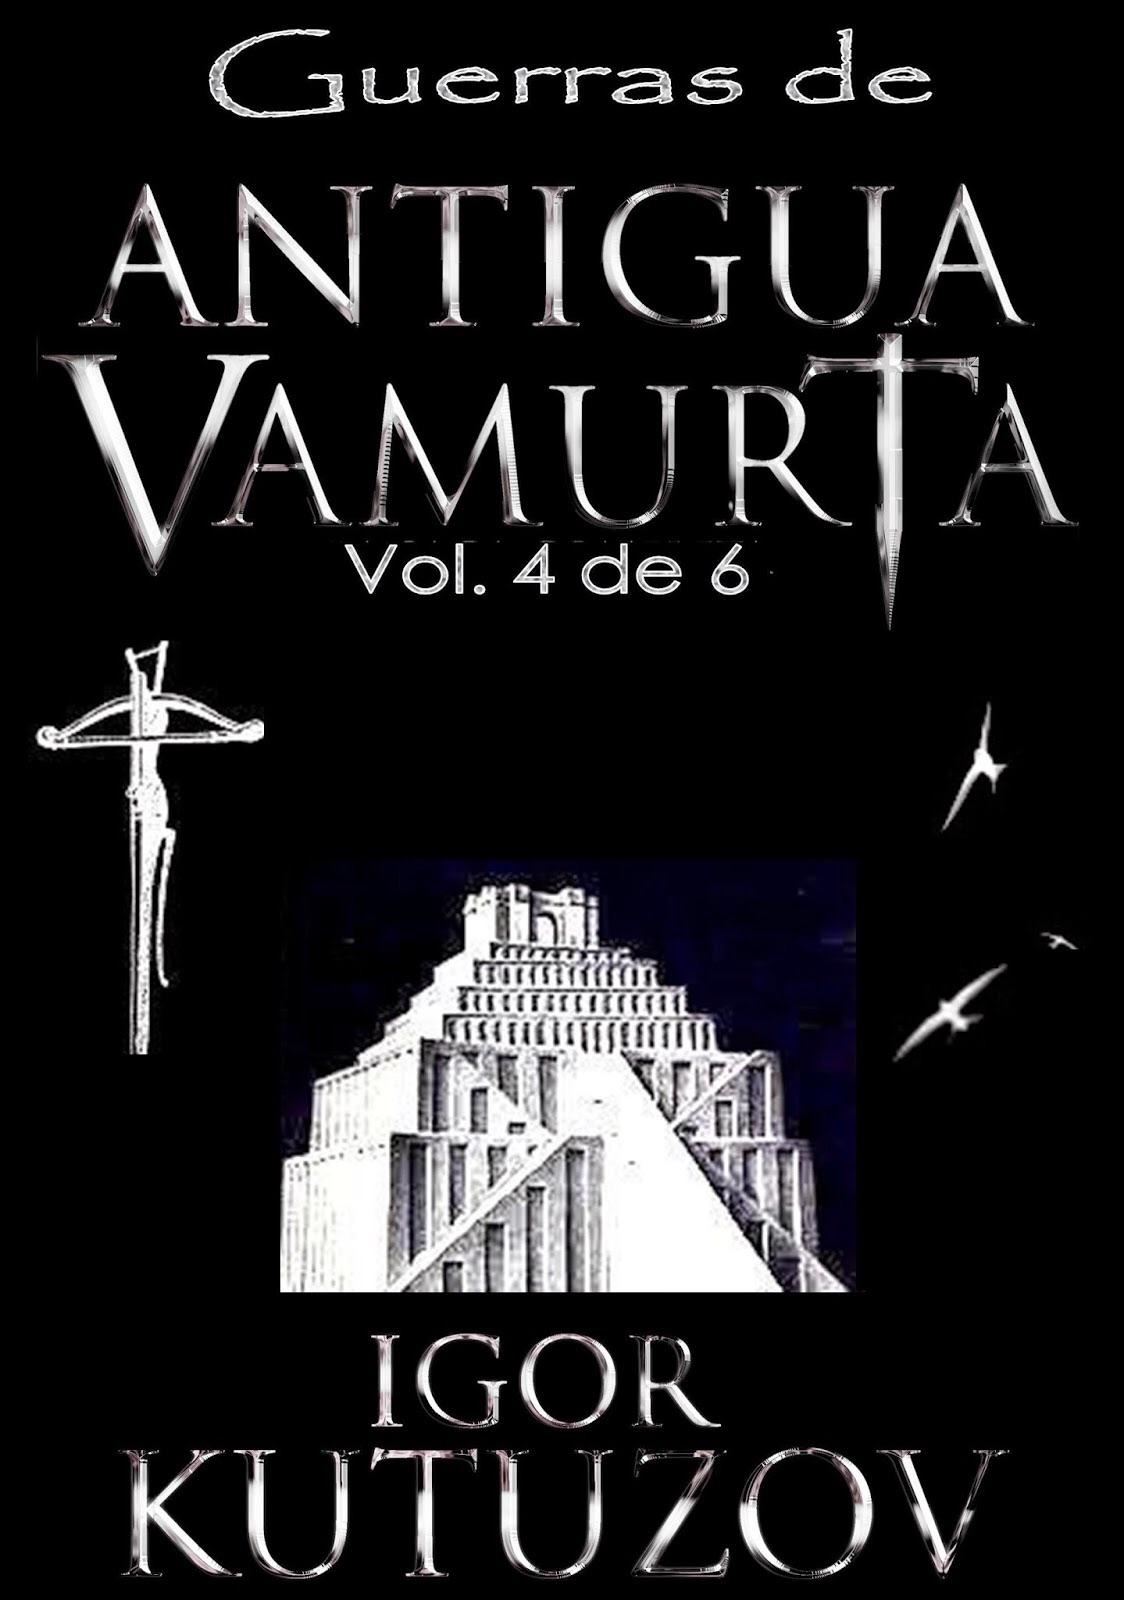 Guerras de Antigua Vamurta, Vol. 4